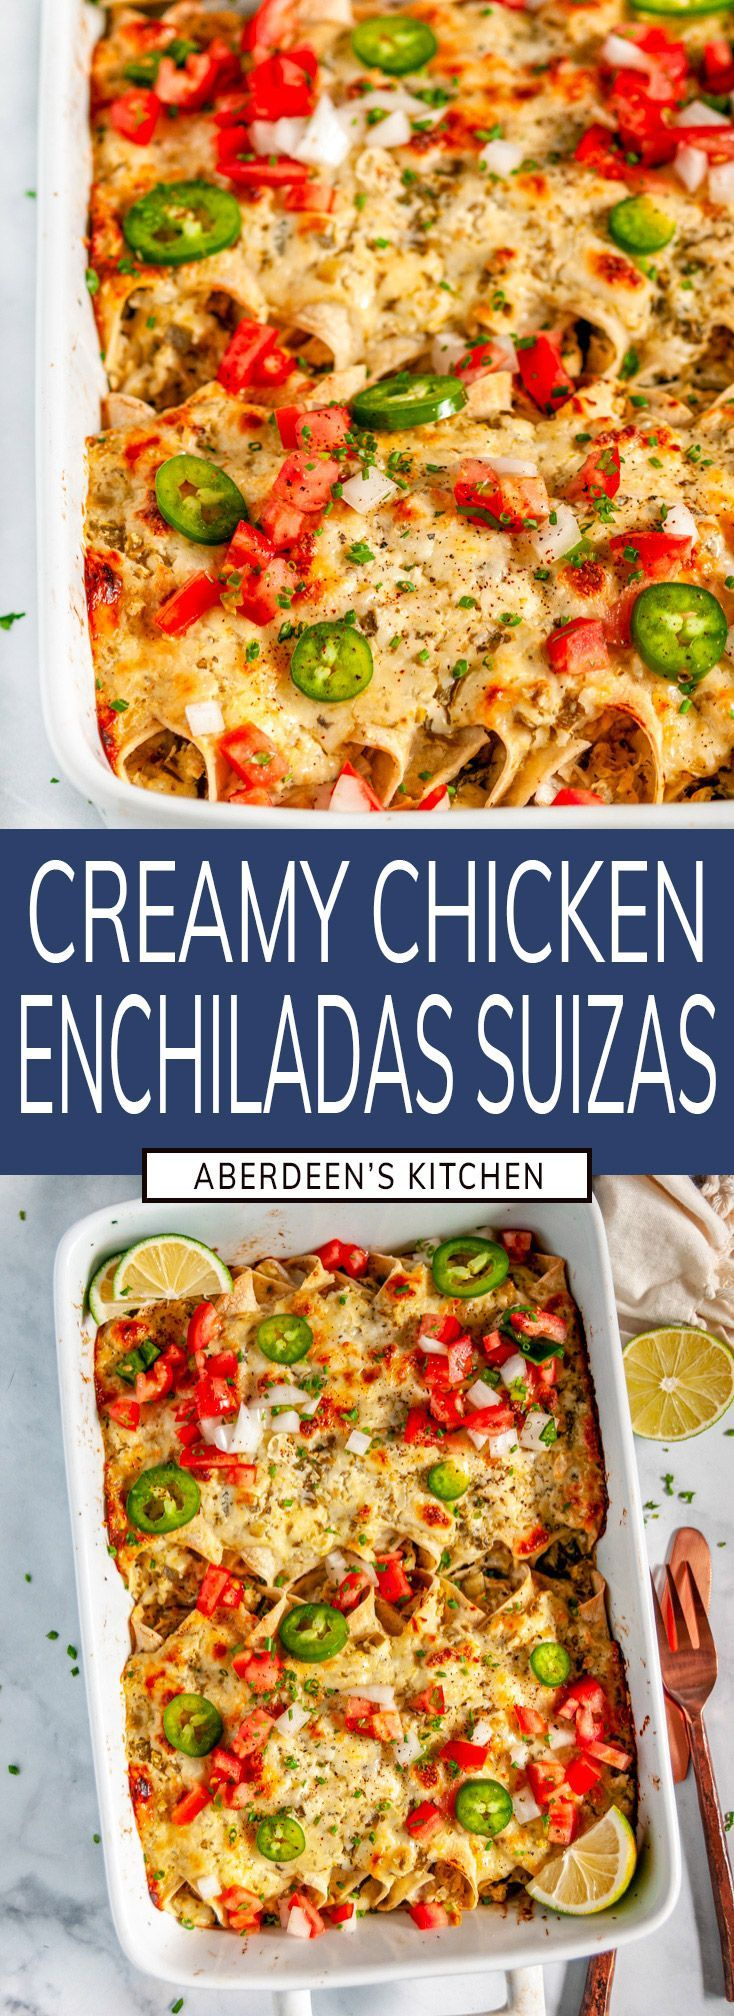 Chicken Enchiladas Suizas – Deliciously cheesy chicken enchiladas in a rich, creamy, salsa verde sauce, no heavy cream n…